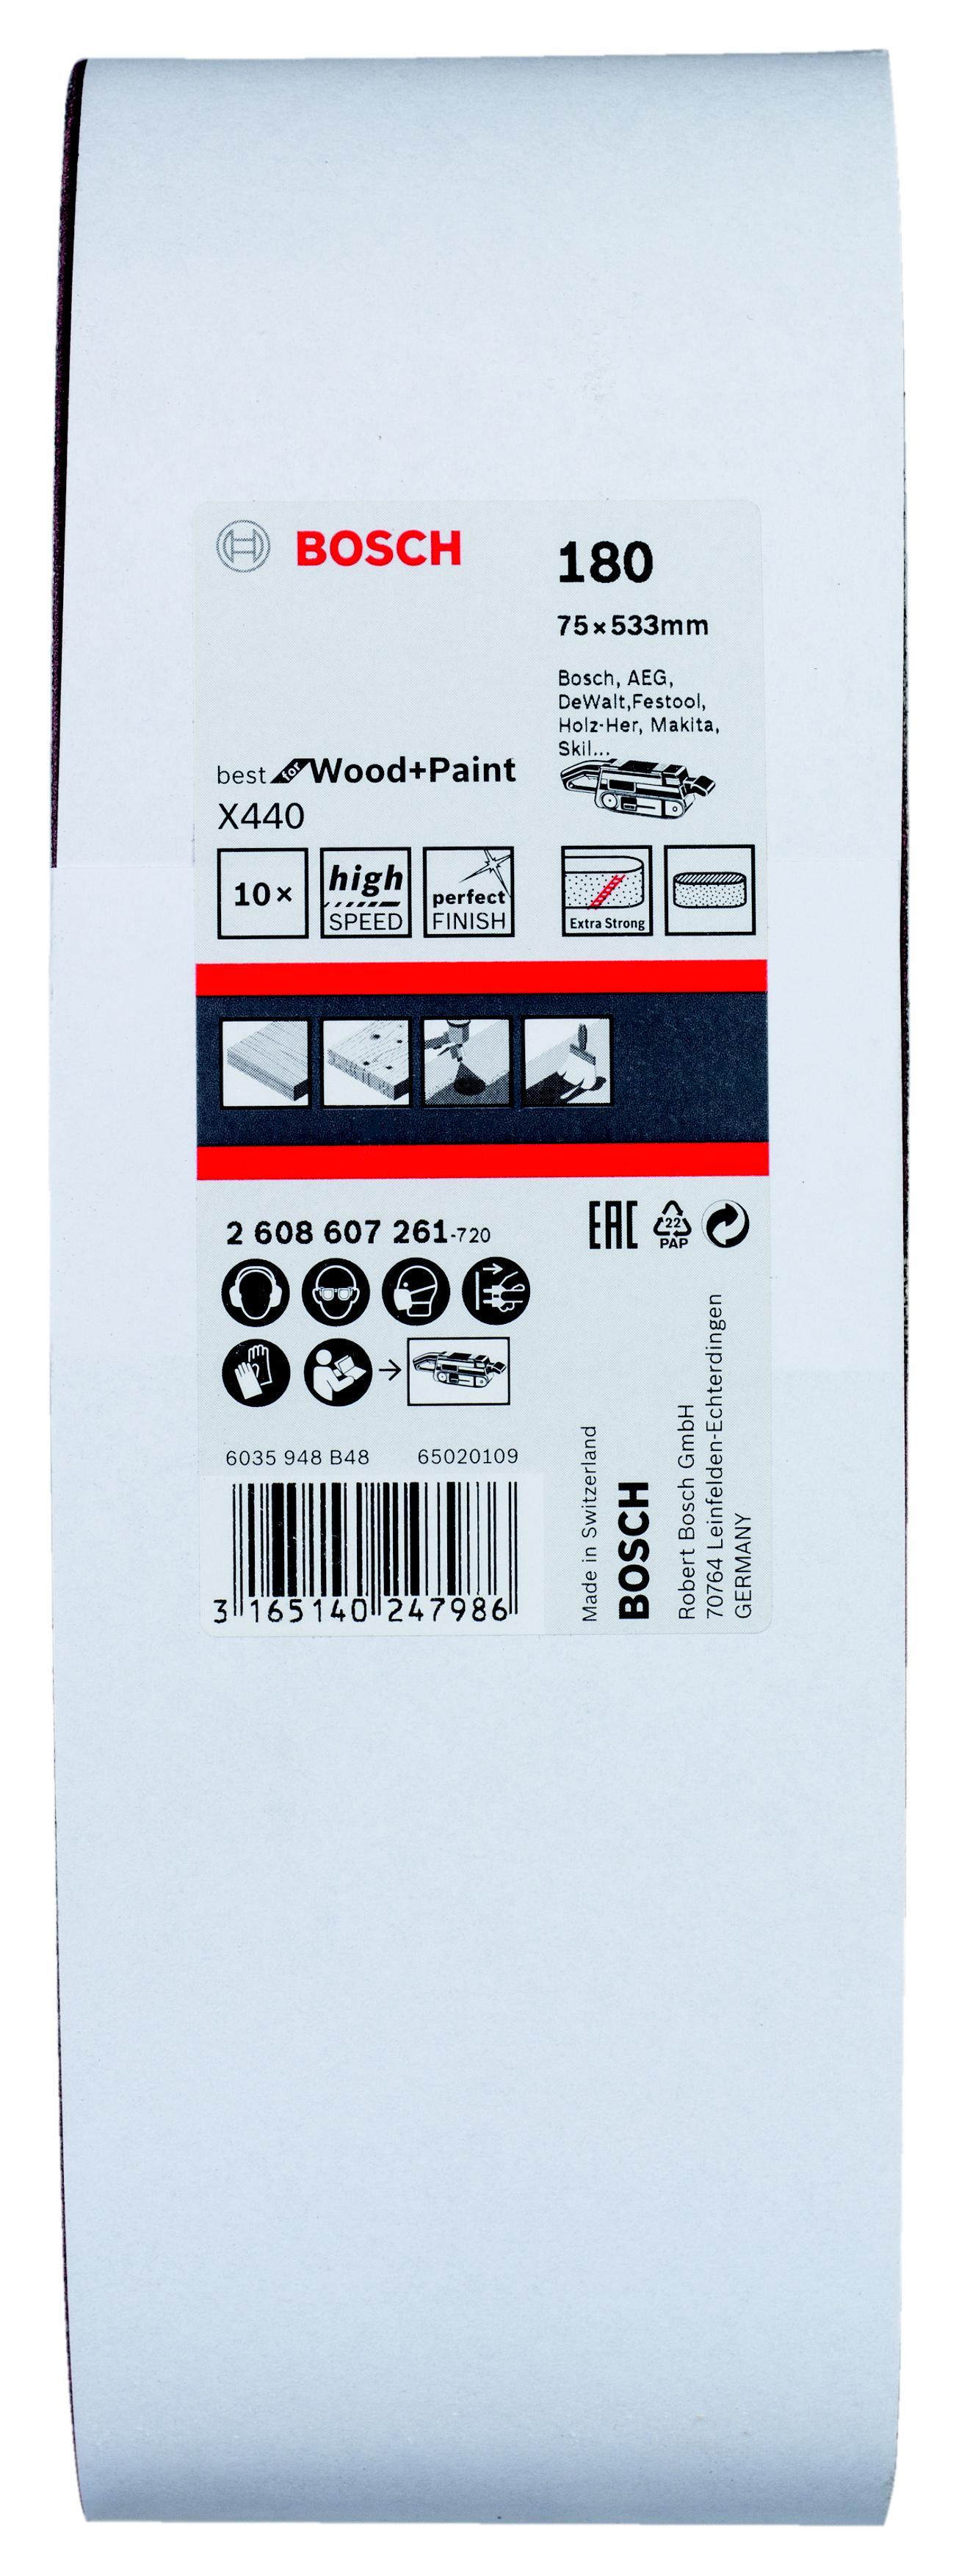 цена на Лента шлиф. бесконечная Bosch 75х533мм p180